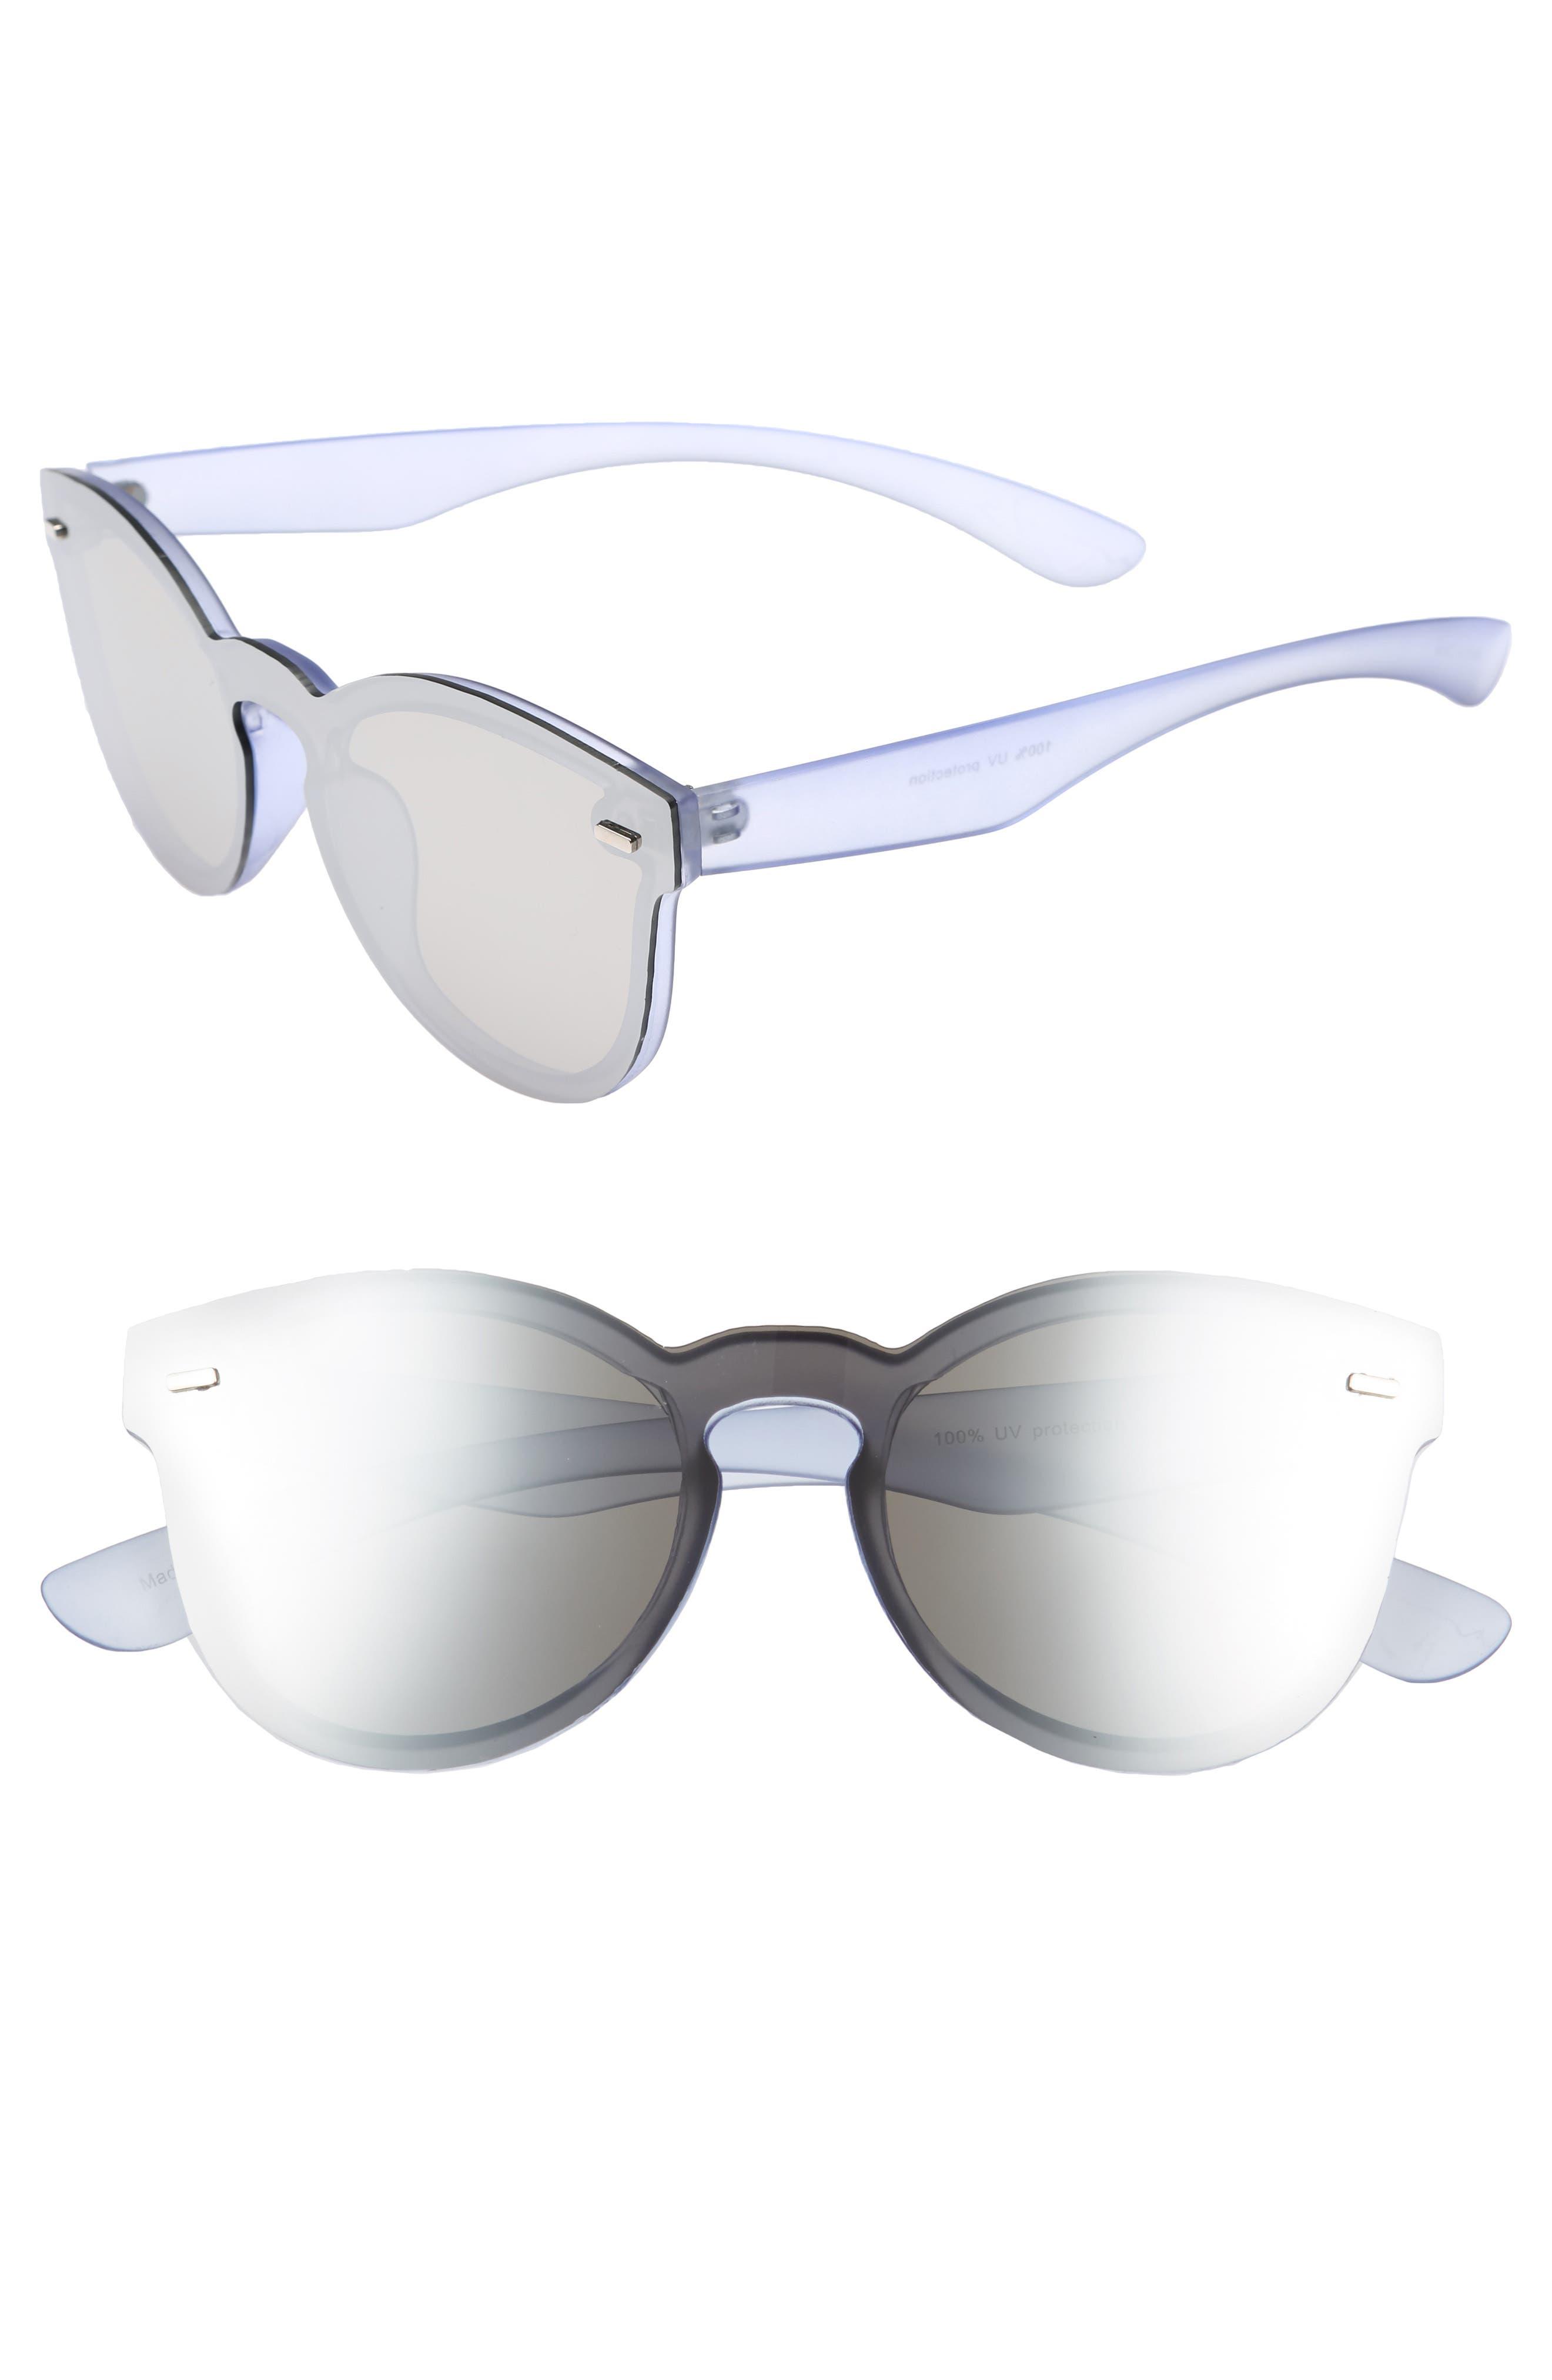 Alternate Image 1 Selected - BP. 50mm Mirrored Lens Rimless Sunglasses